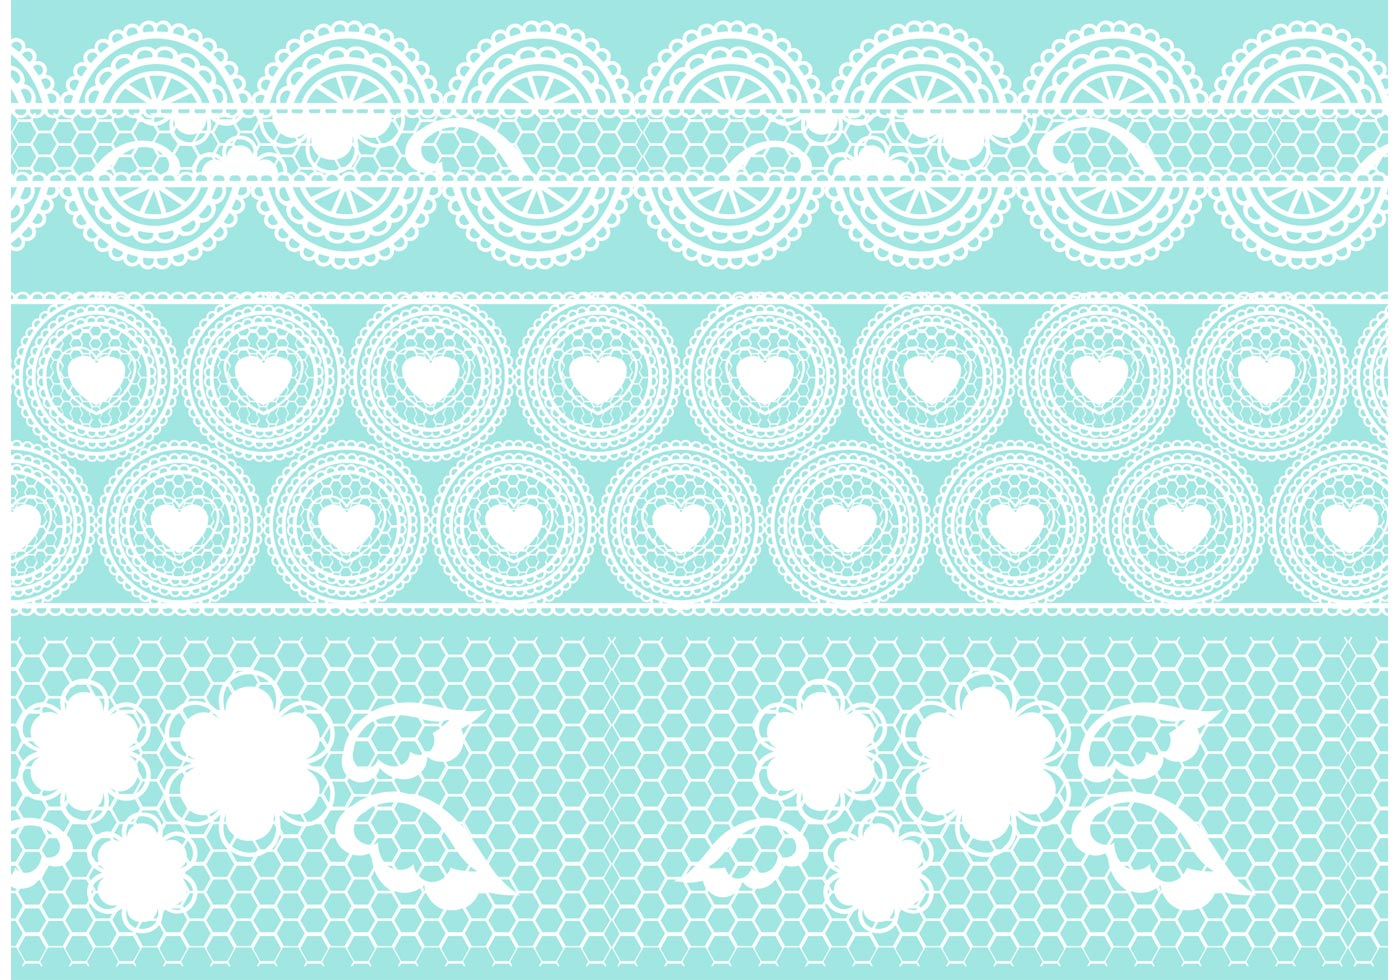 Crochet Patterns Vector : Crochet Lace Vector Set - Download Free Vector Art, Stock ...